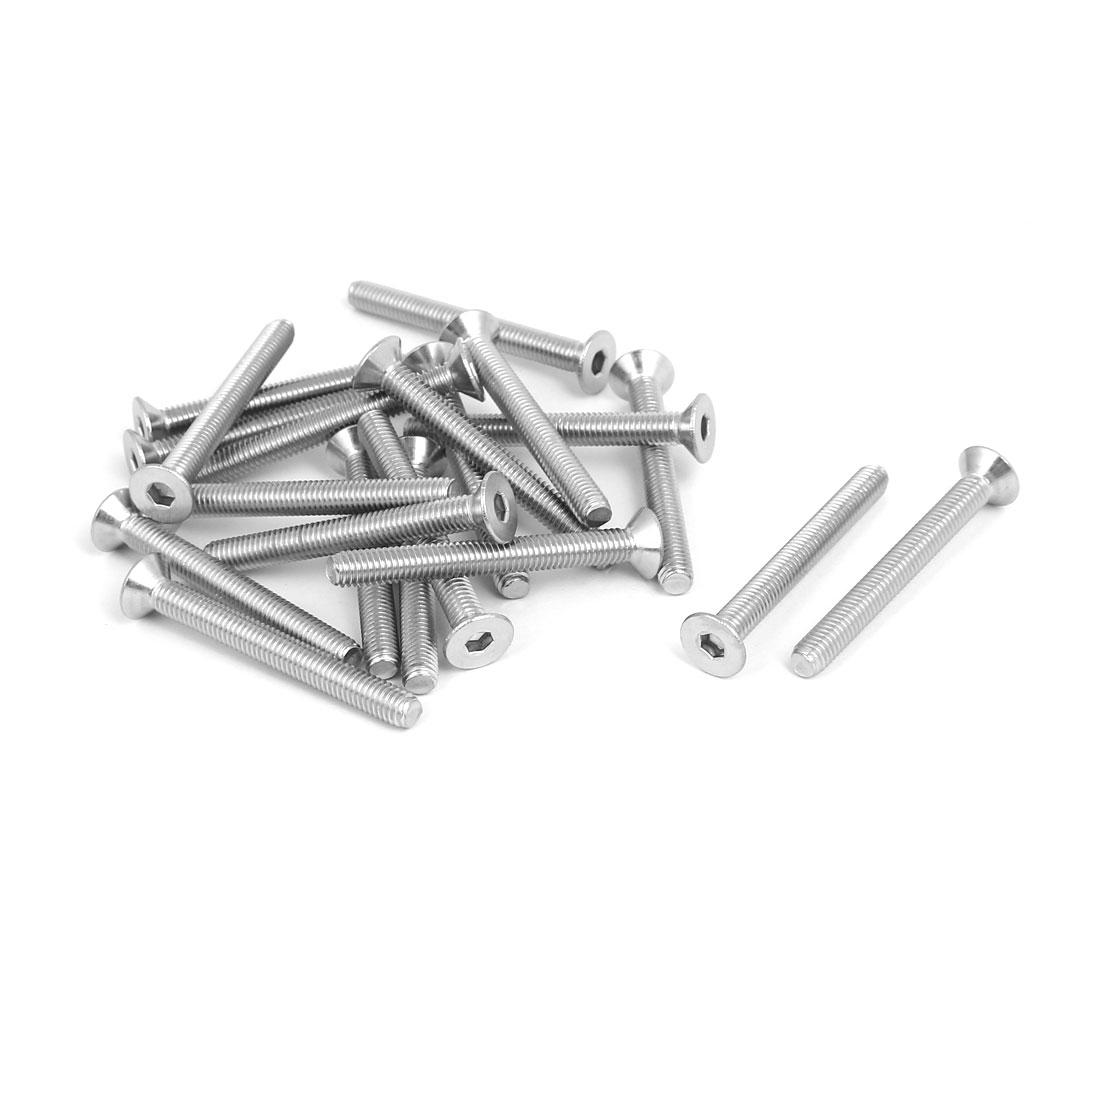 M6x55mm 304 Stainless Steel Countersunk Flat Head Hex Socket Screws DIN7991 20pcs